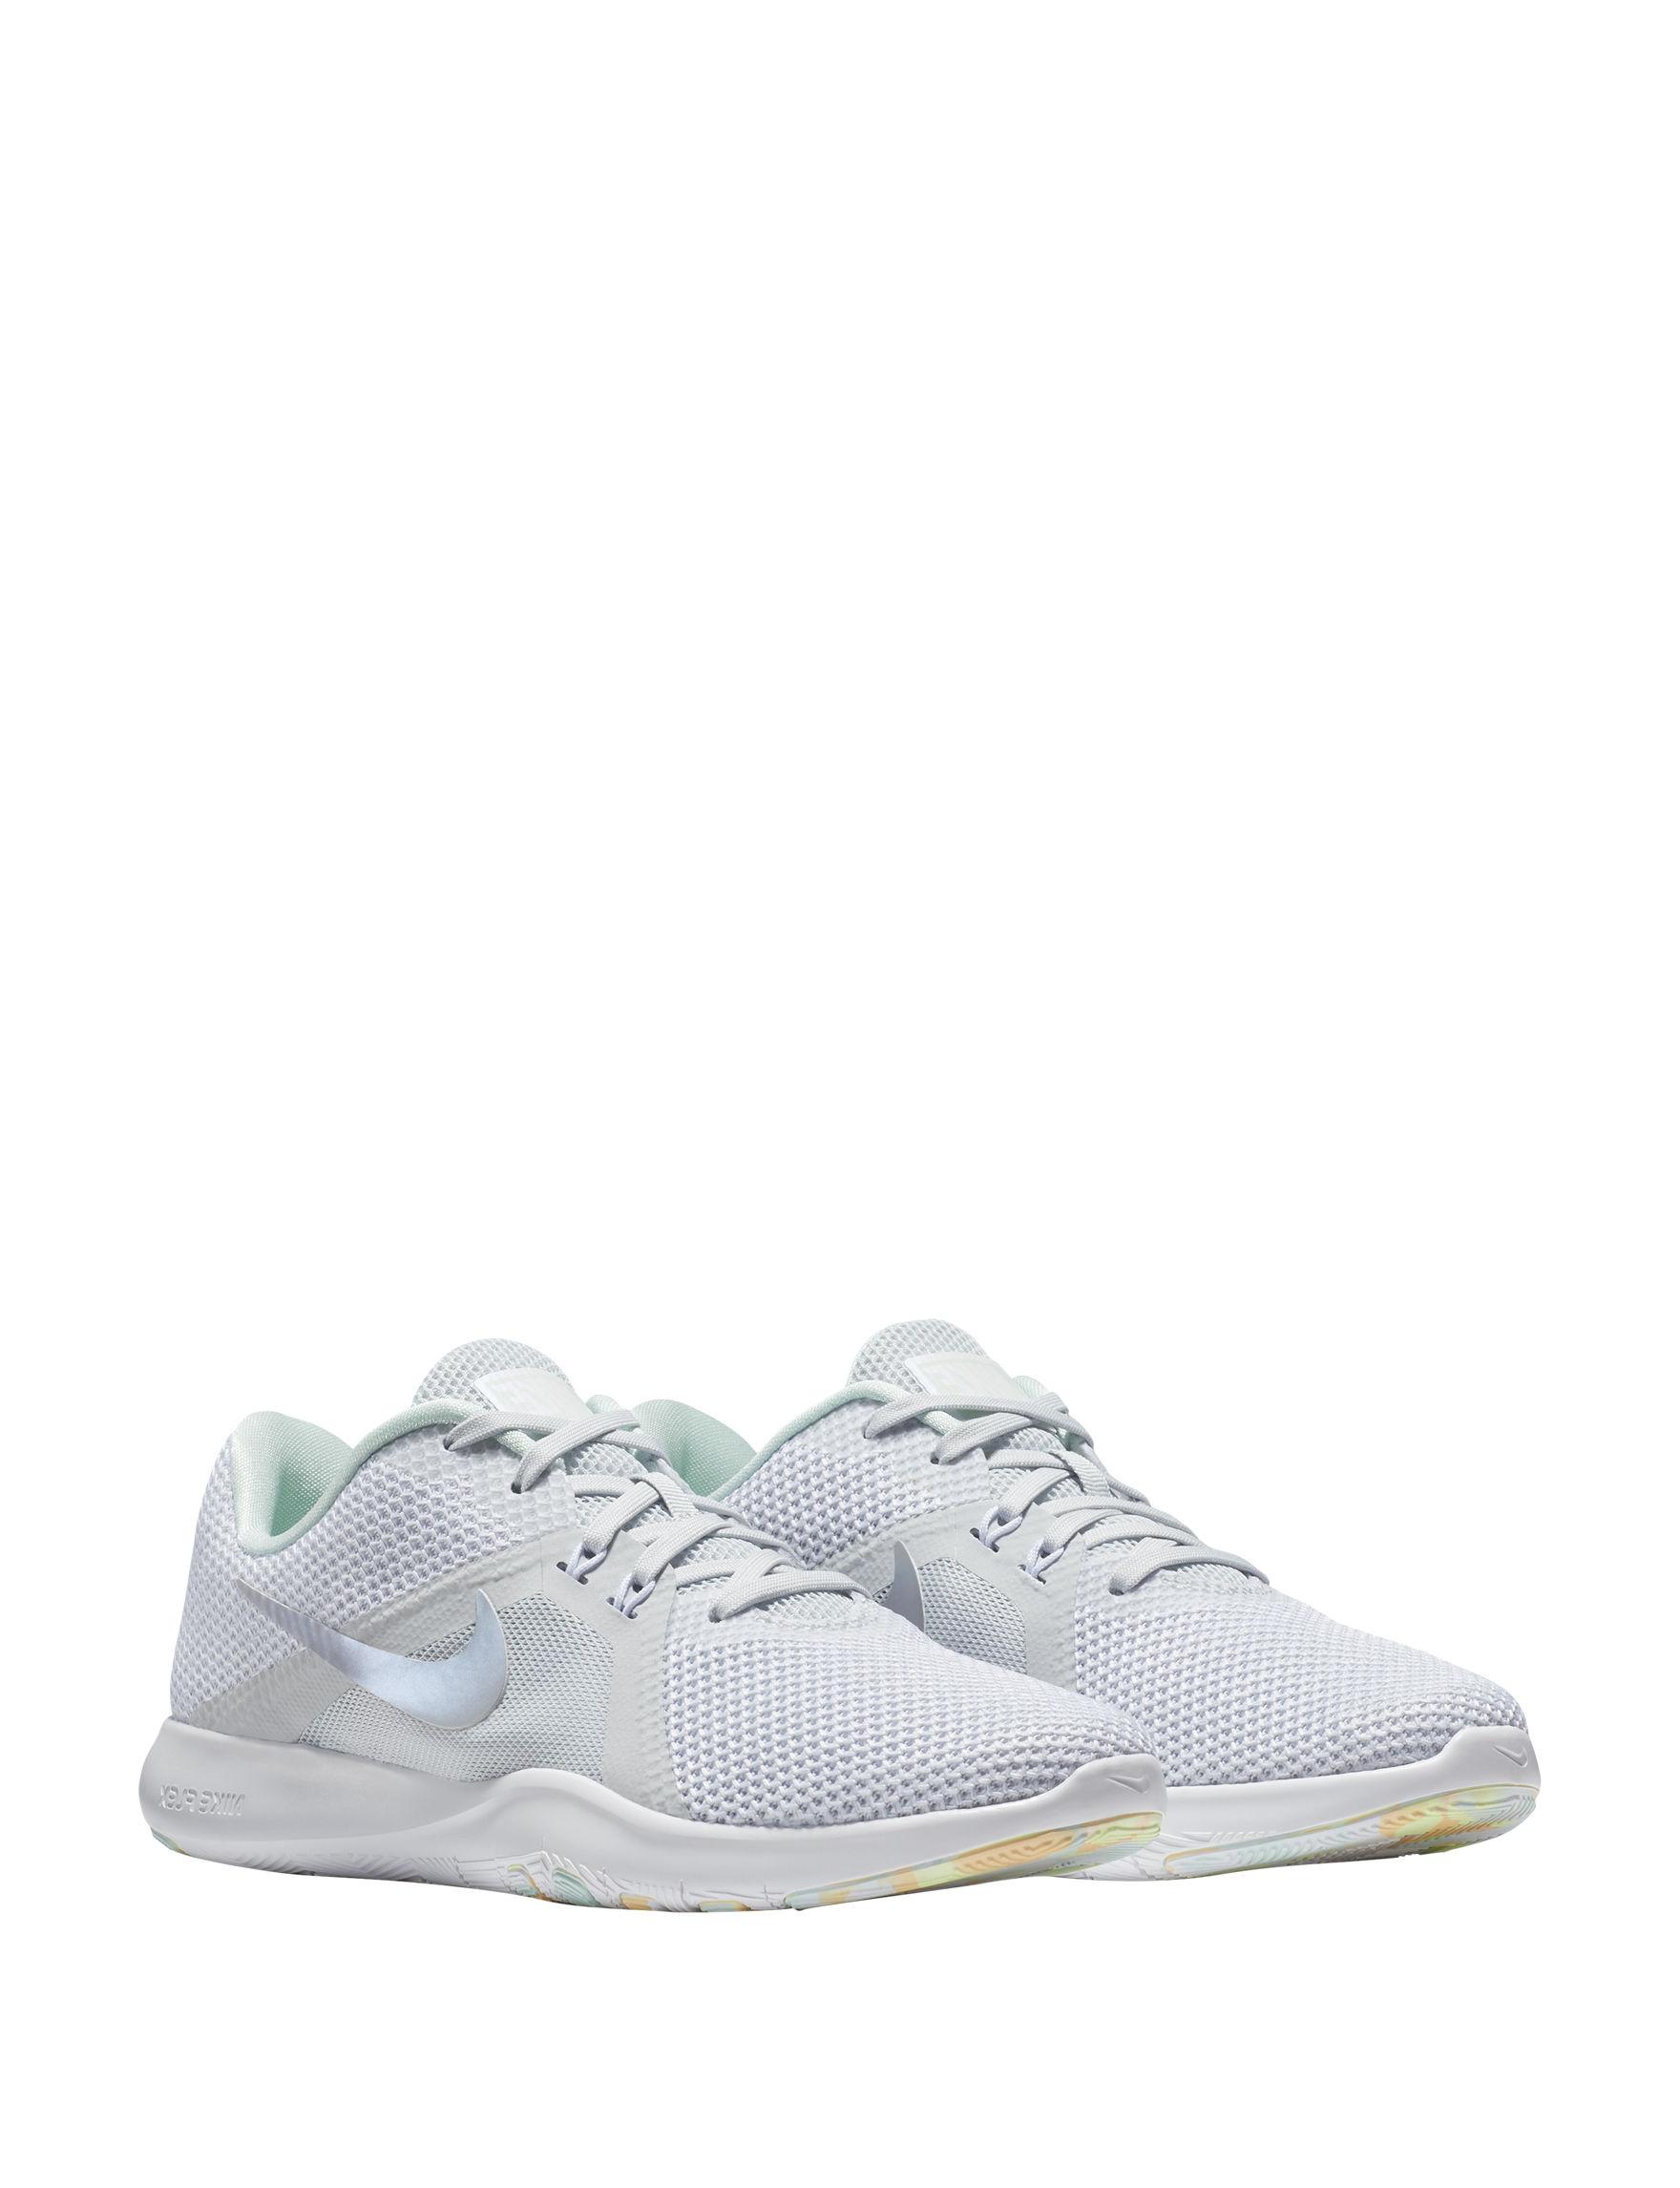 60321856730e Nike Women s Flex TR 8 Premium Training Shoes